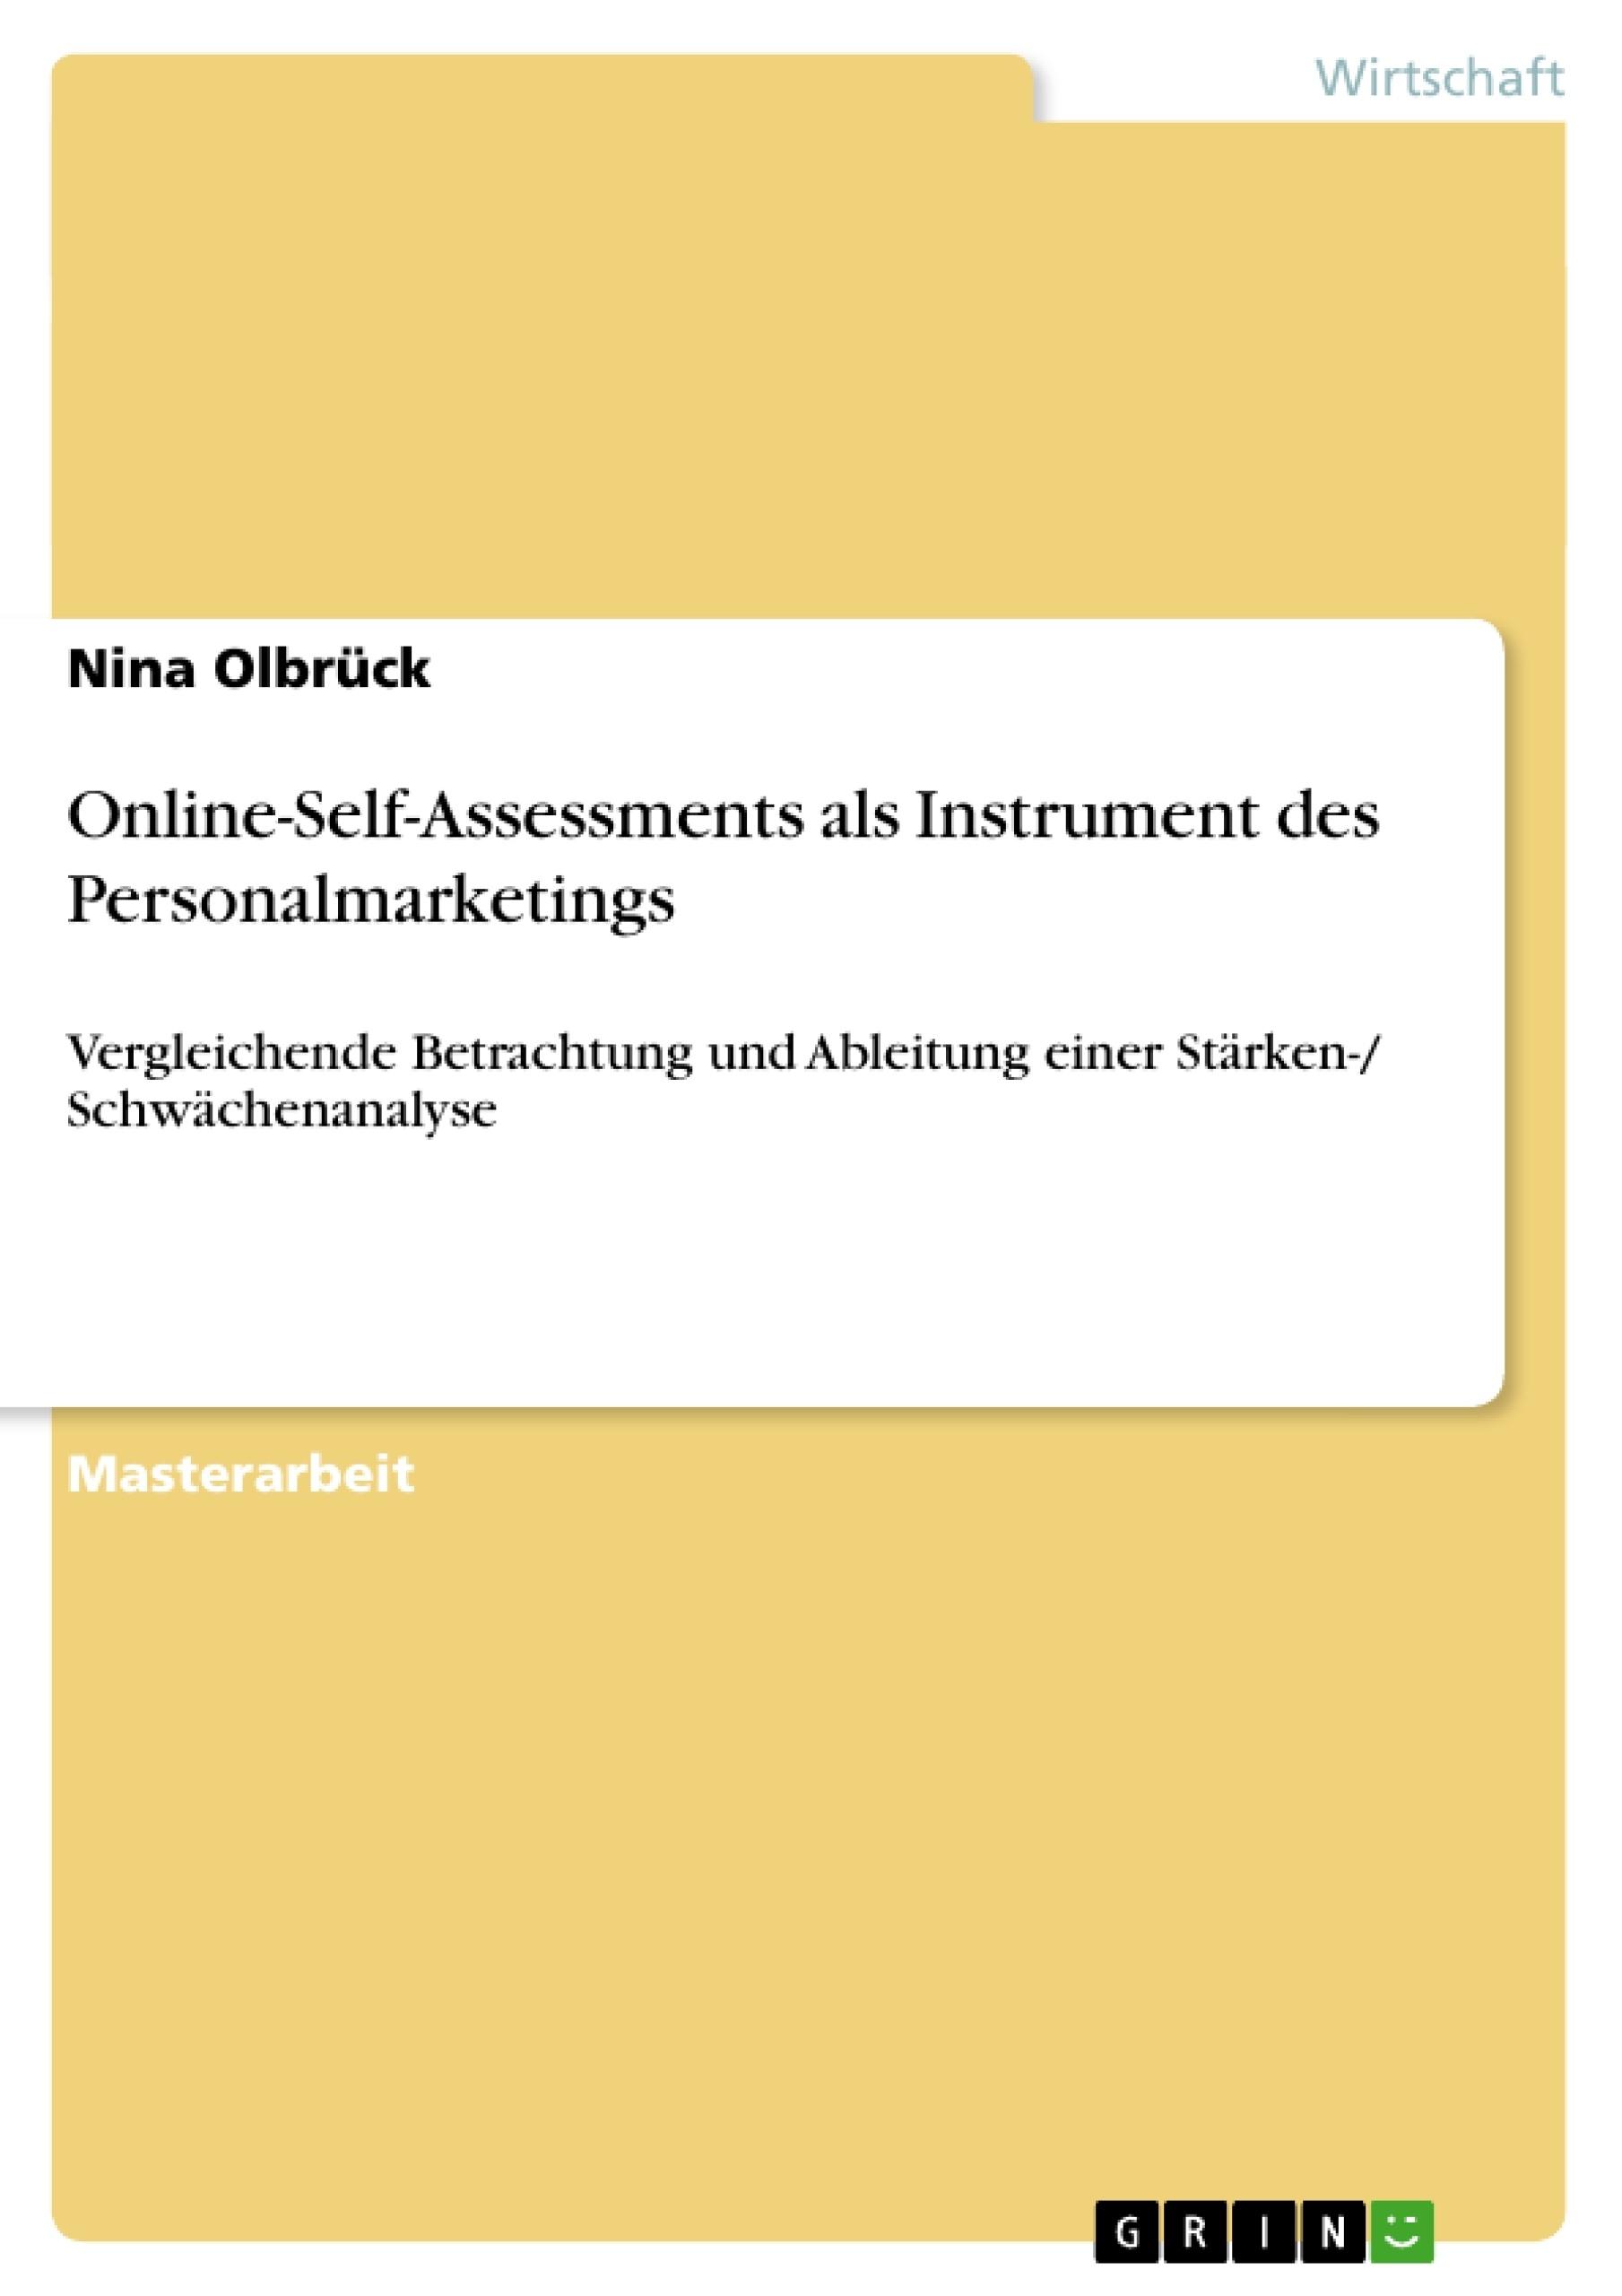 Titel: Online-Self-Assessments als Instrument des Personalmarketings